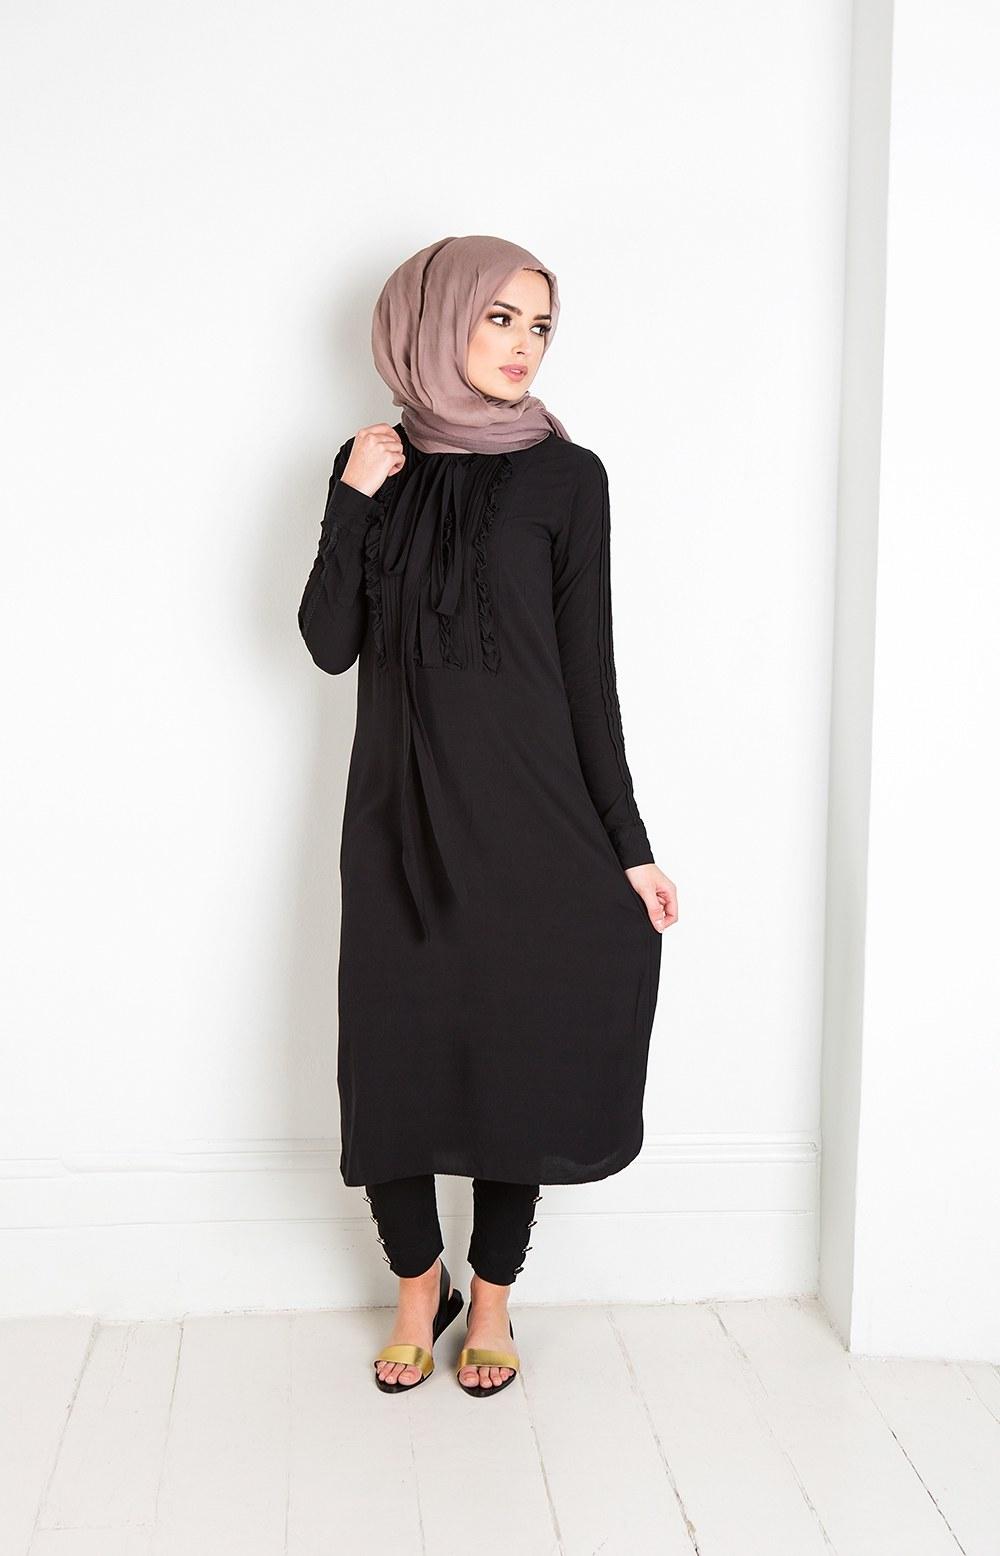 Inspirasi Style Baju Lebaran 4pde 25 Trend Model Baju Muslim Lebaran 2018 Simple & Modis